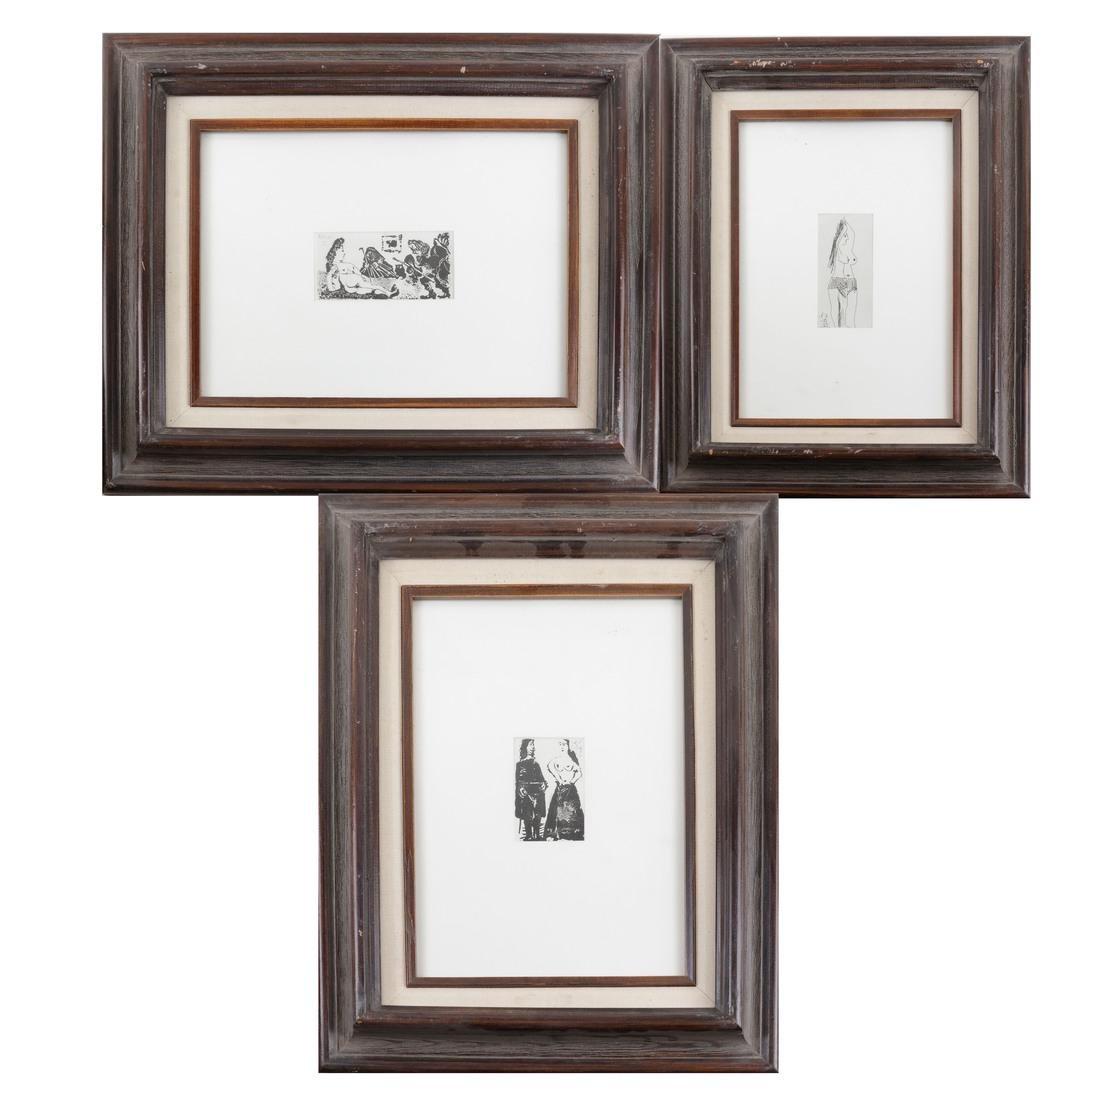 Picasso, Three Nude Prints